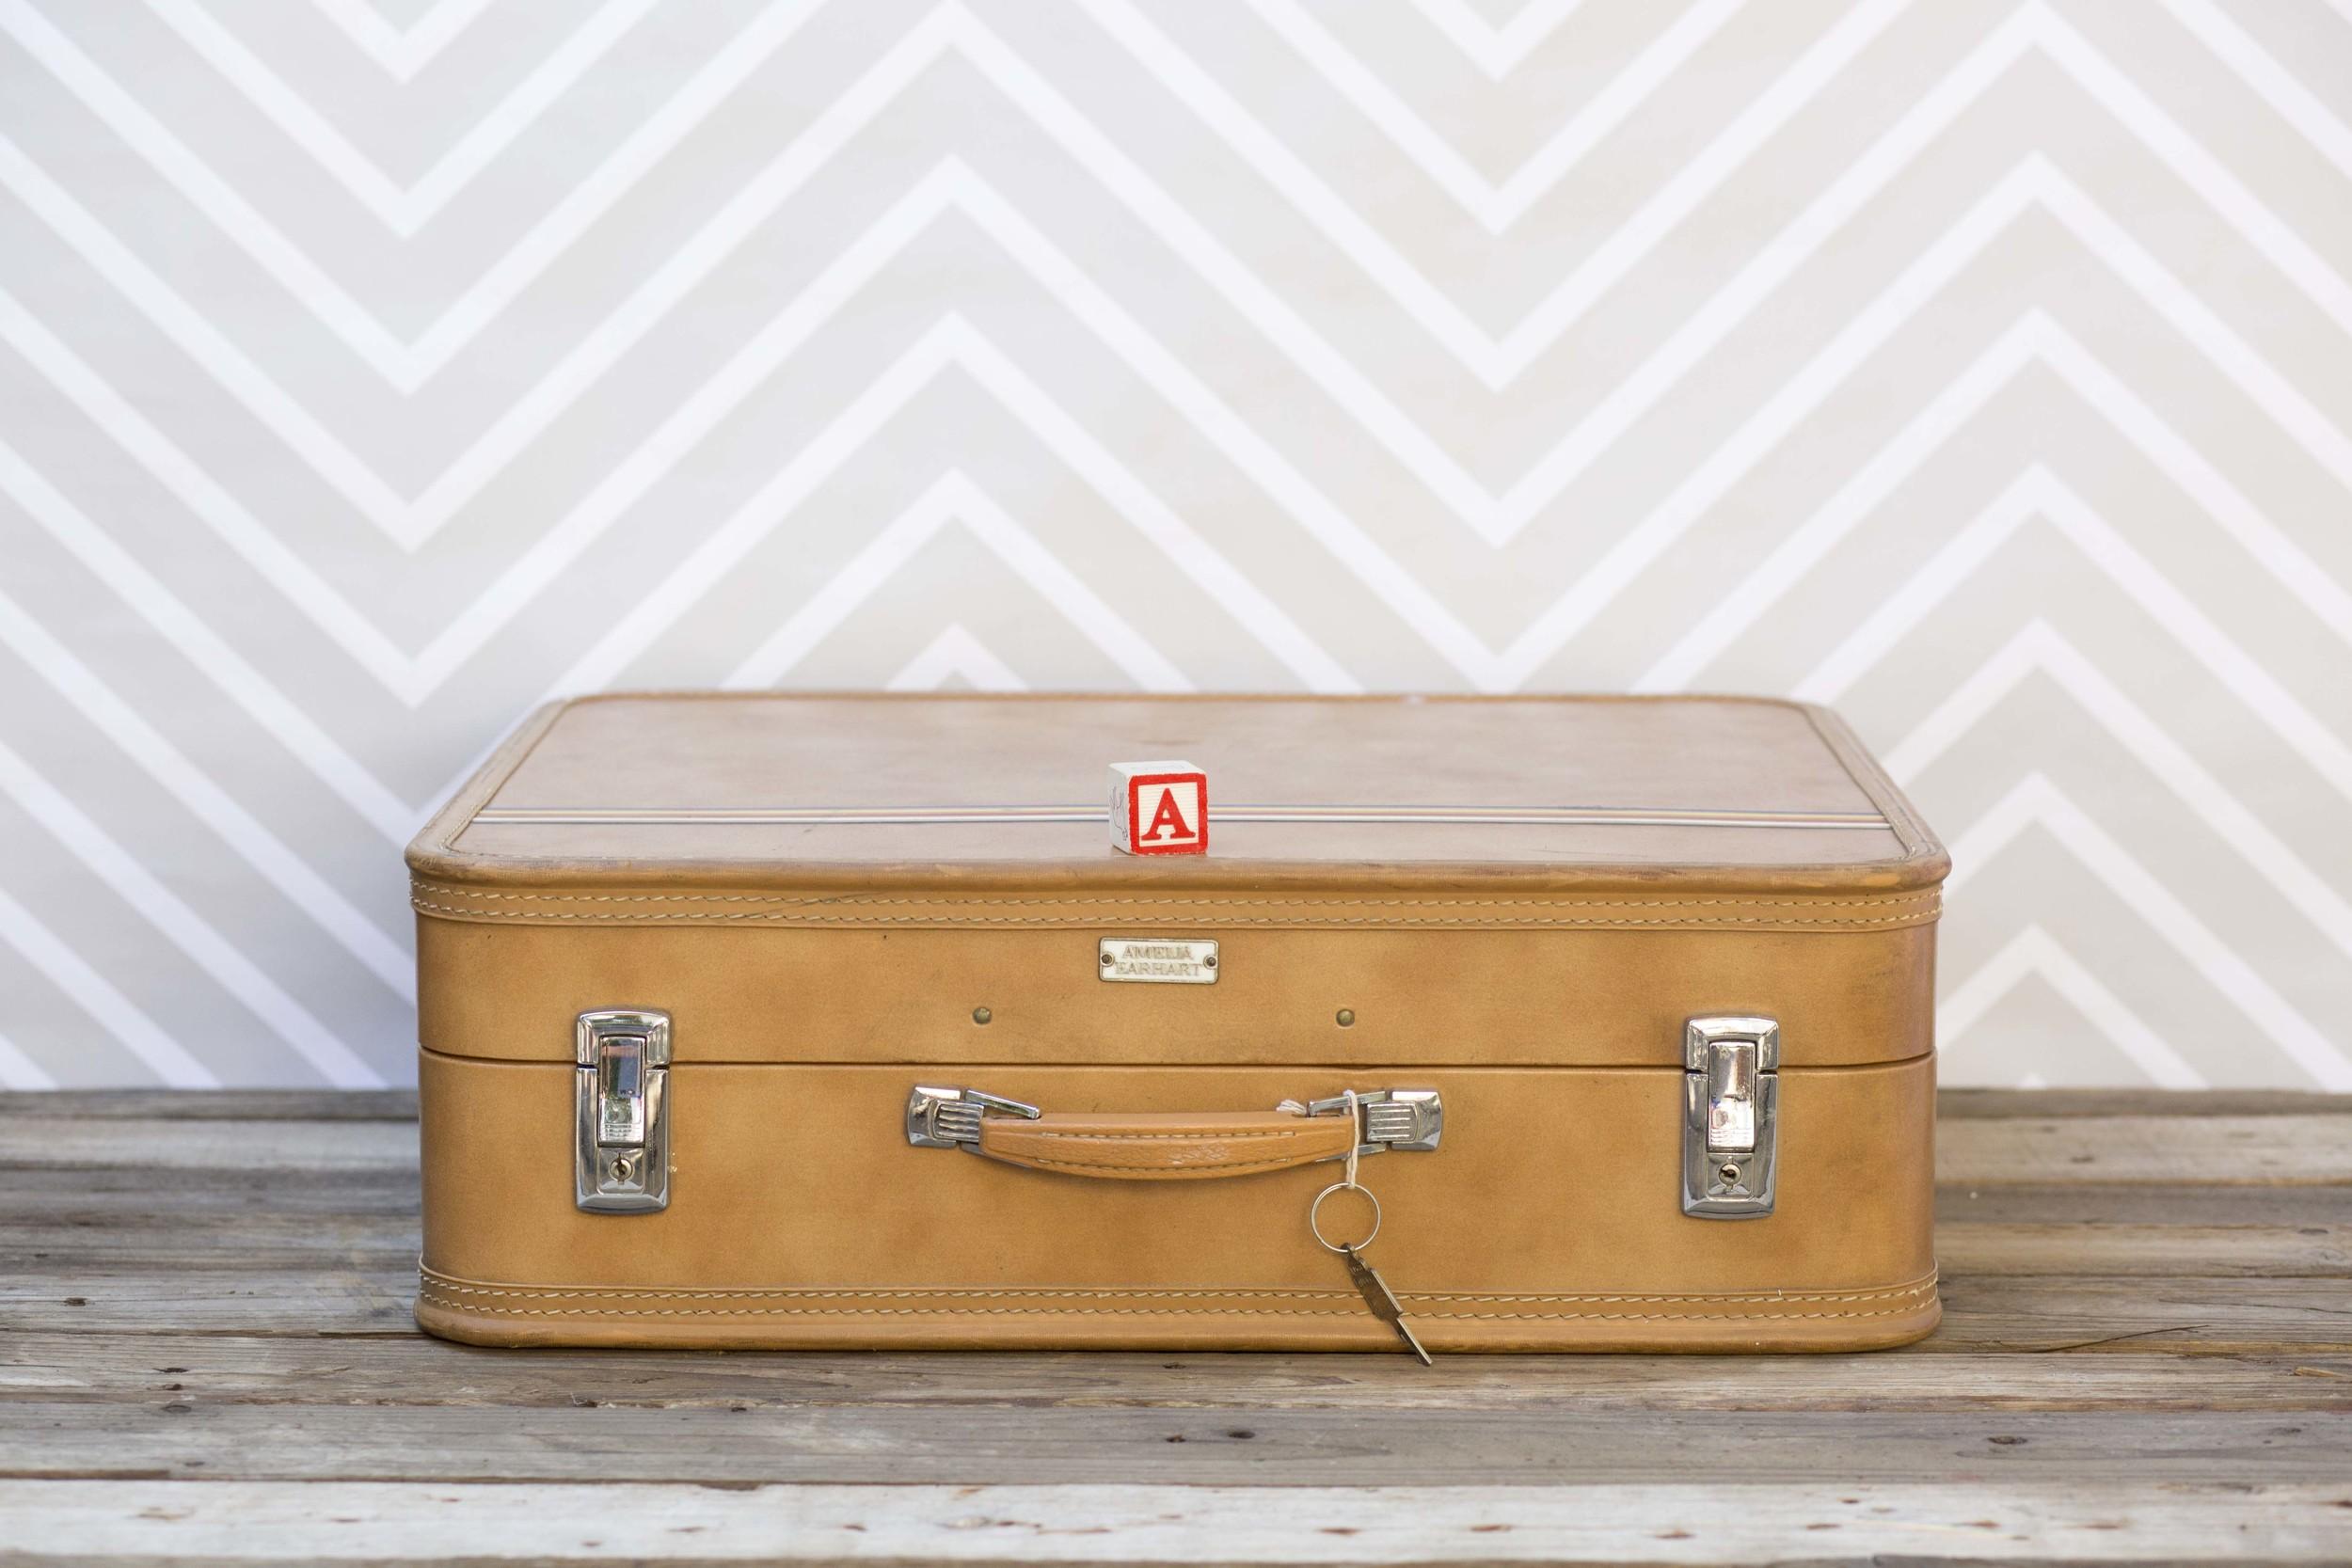 SuitcaseSample328A4999.jpg